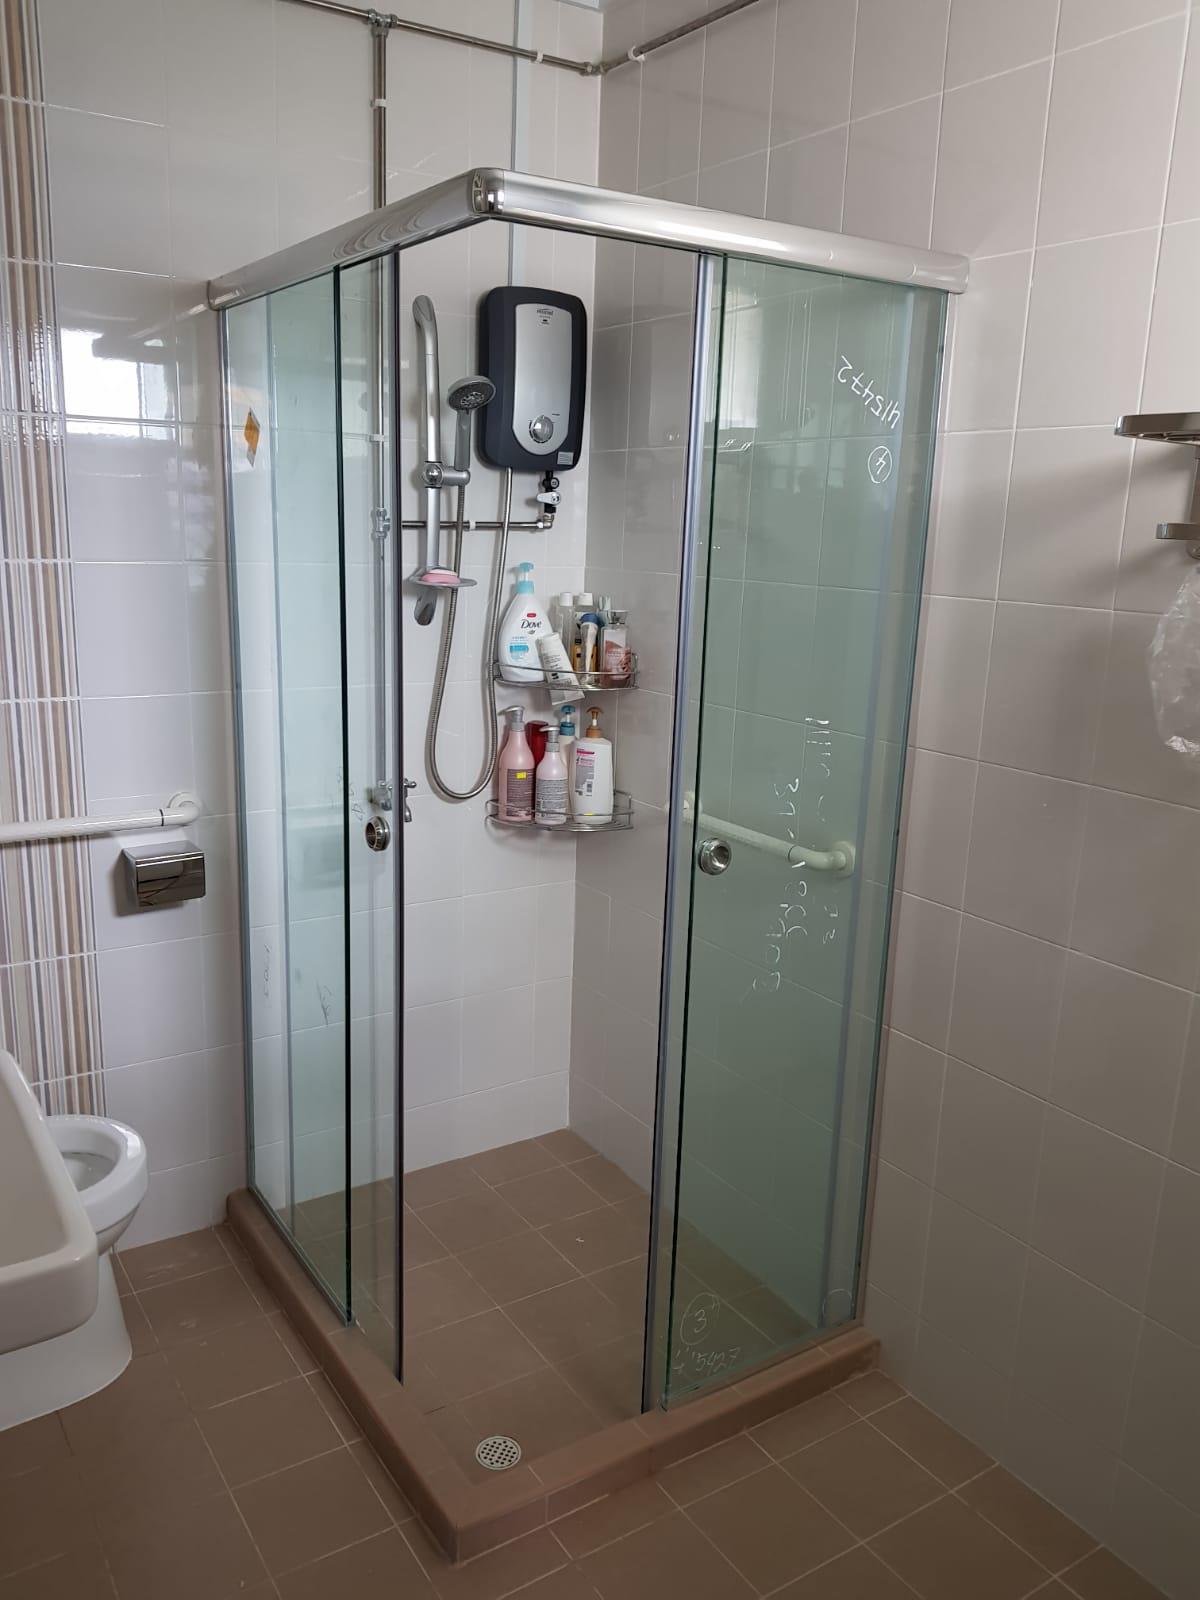 Toilet Shower Screen Toilet Amp Bathroom Renovation Singapore